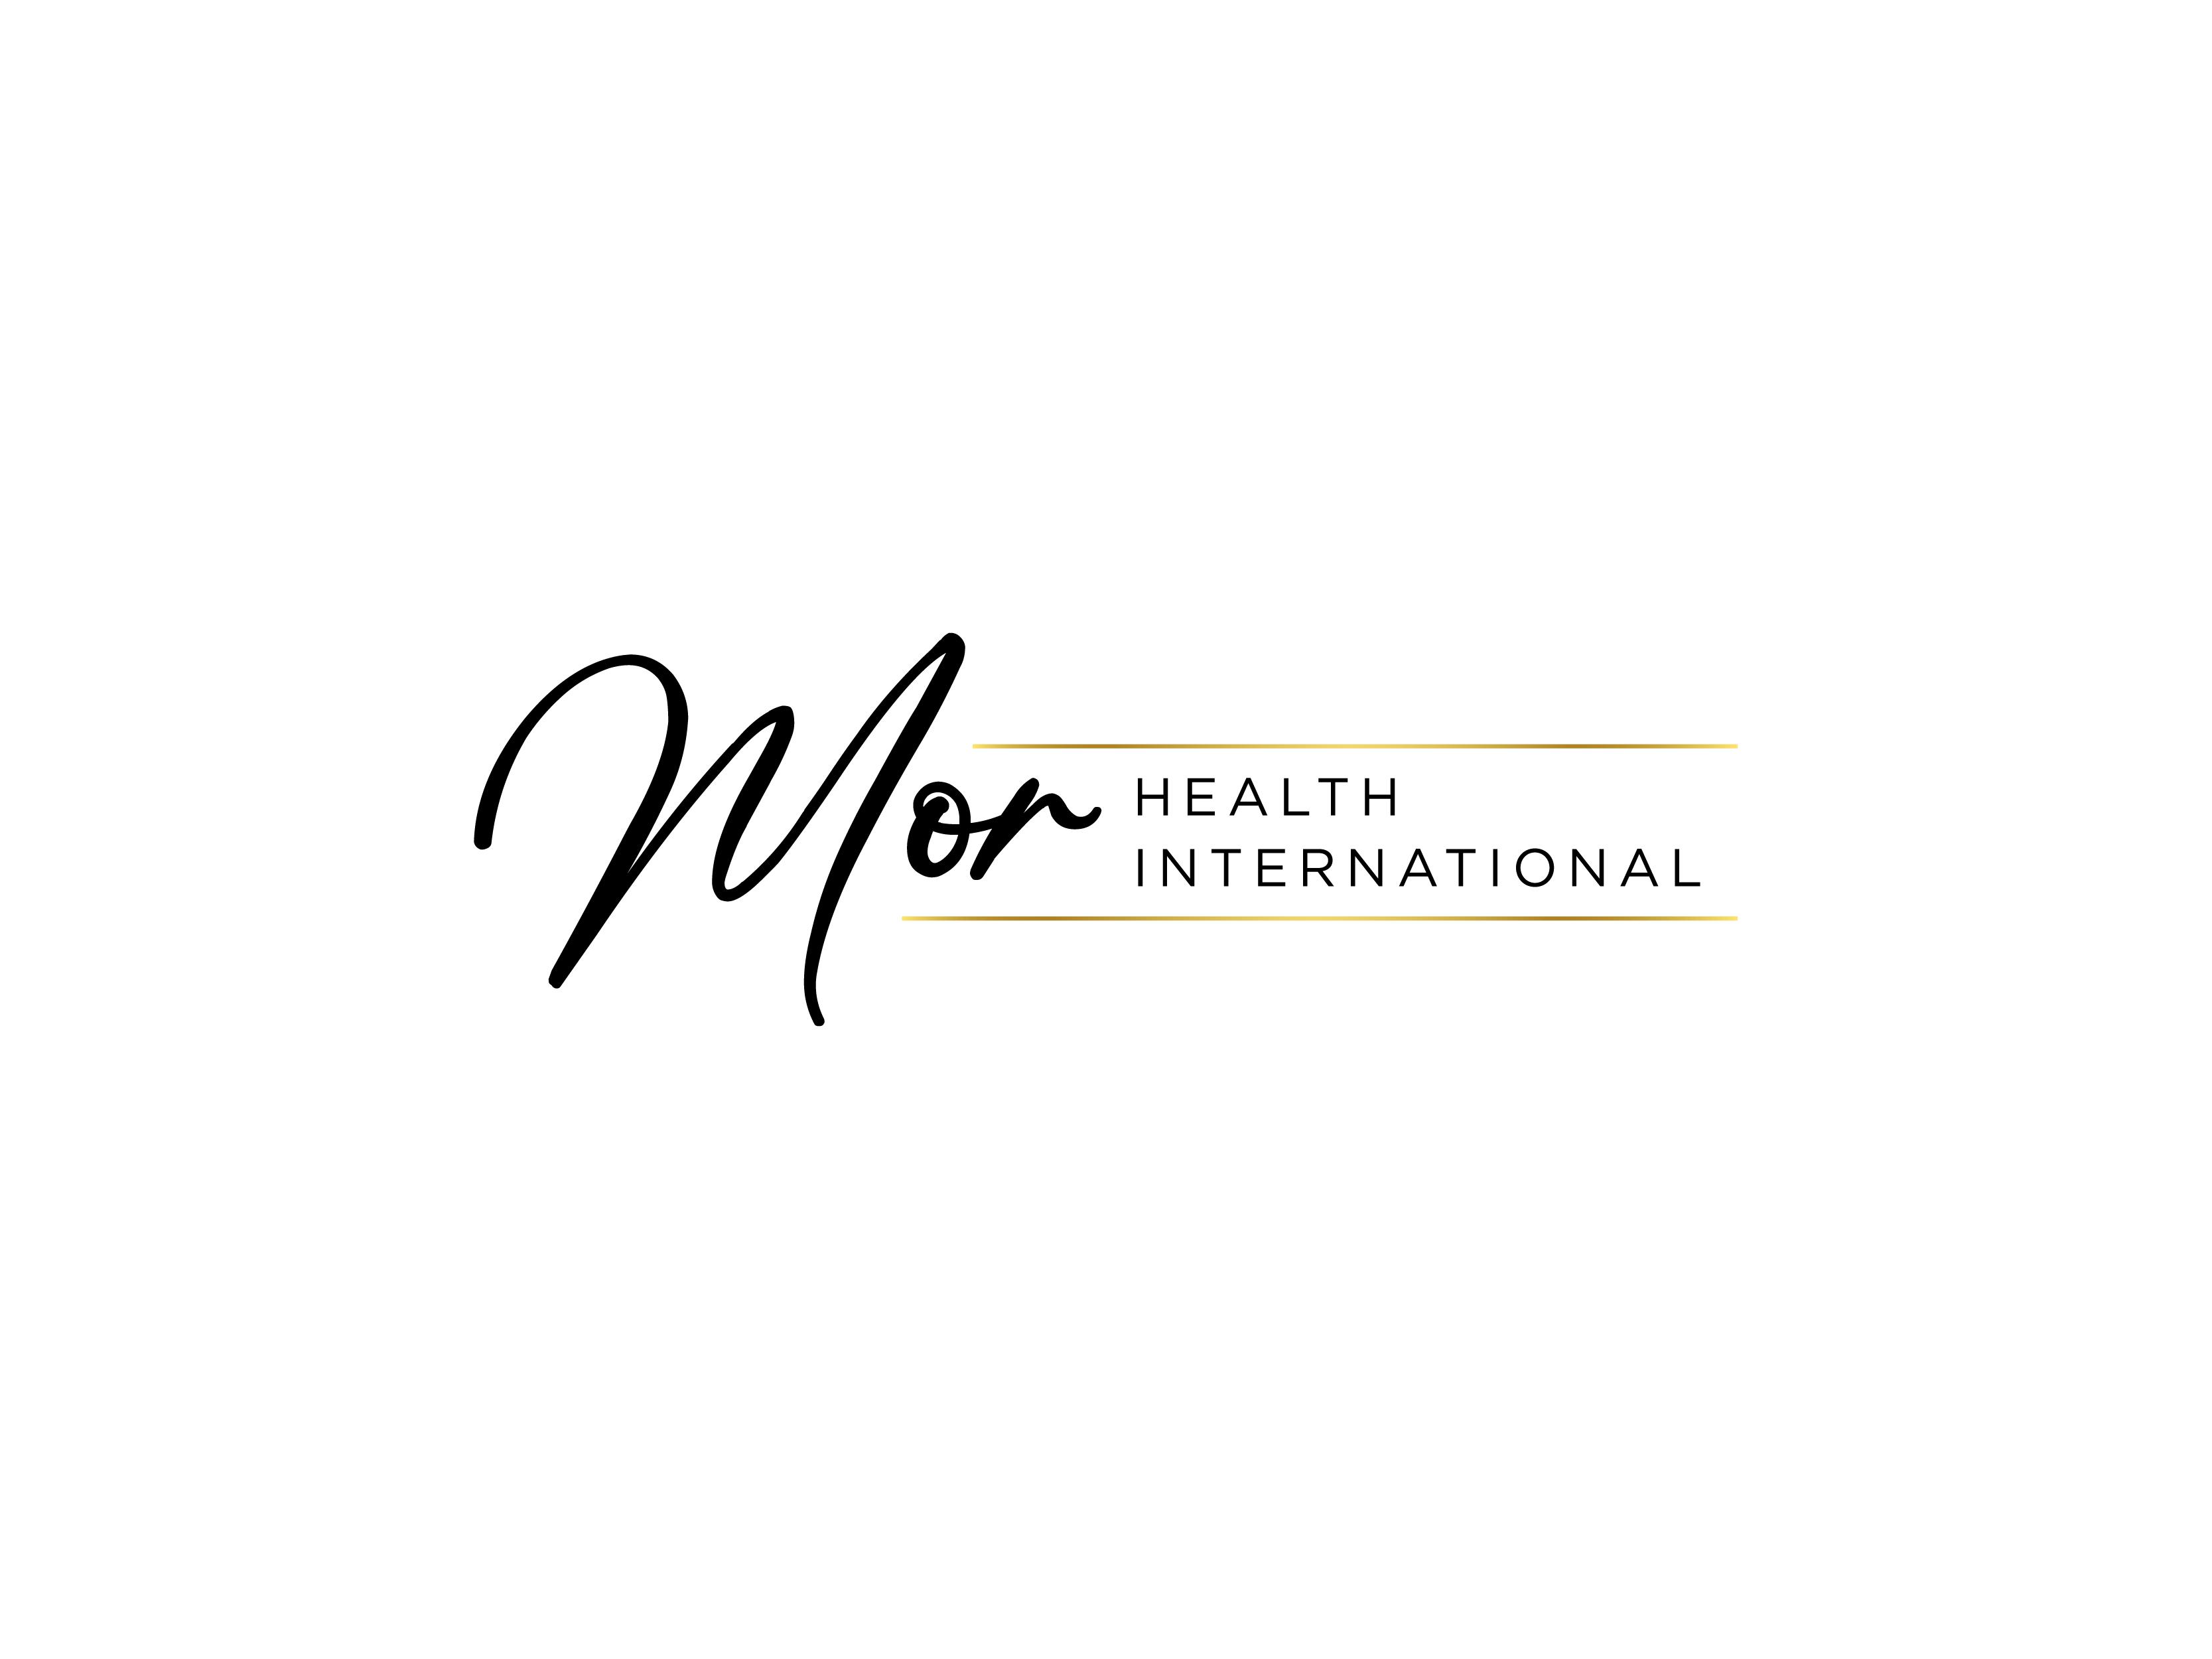 MOR Health International